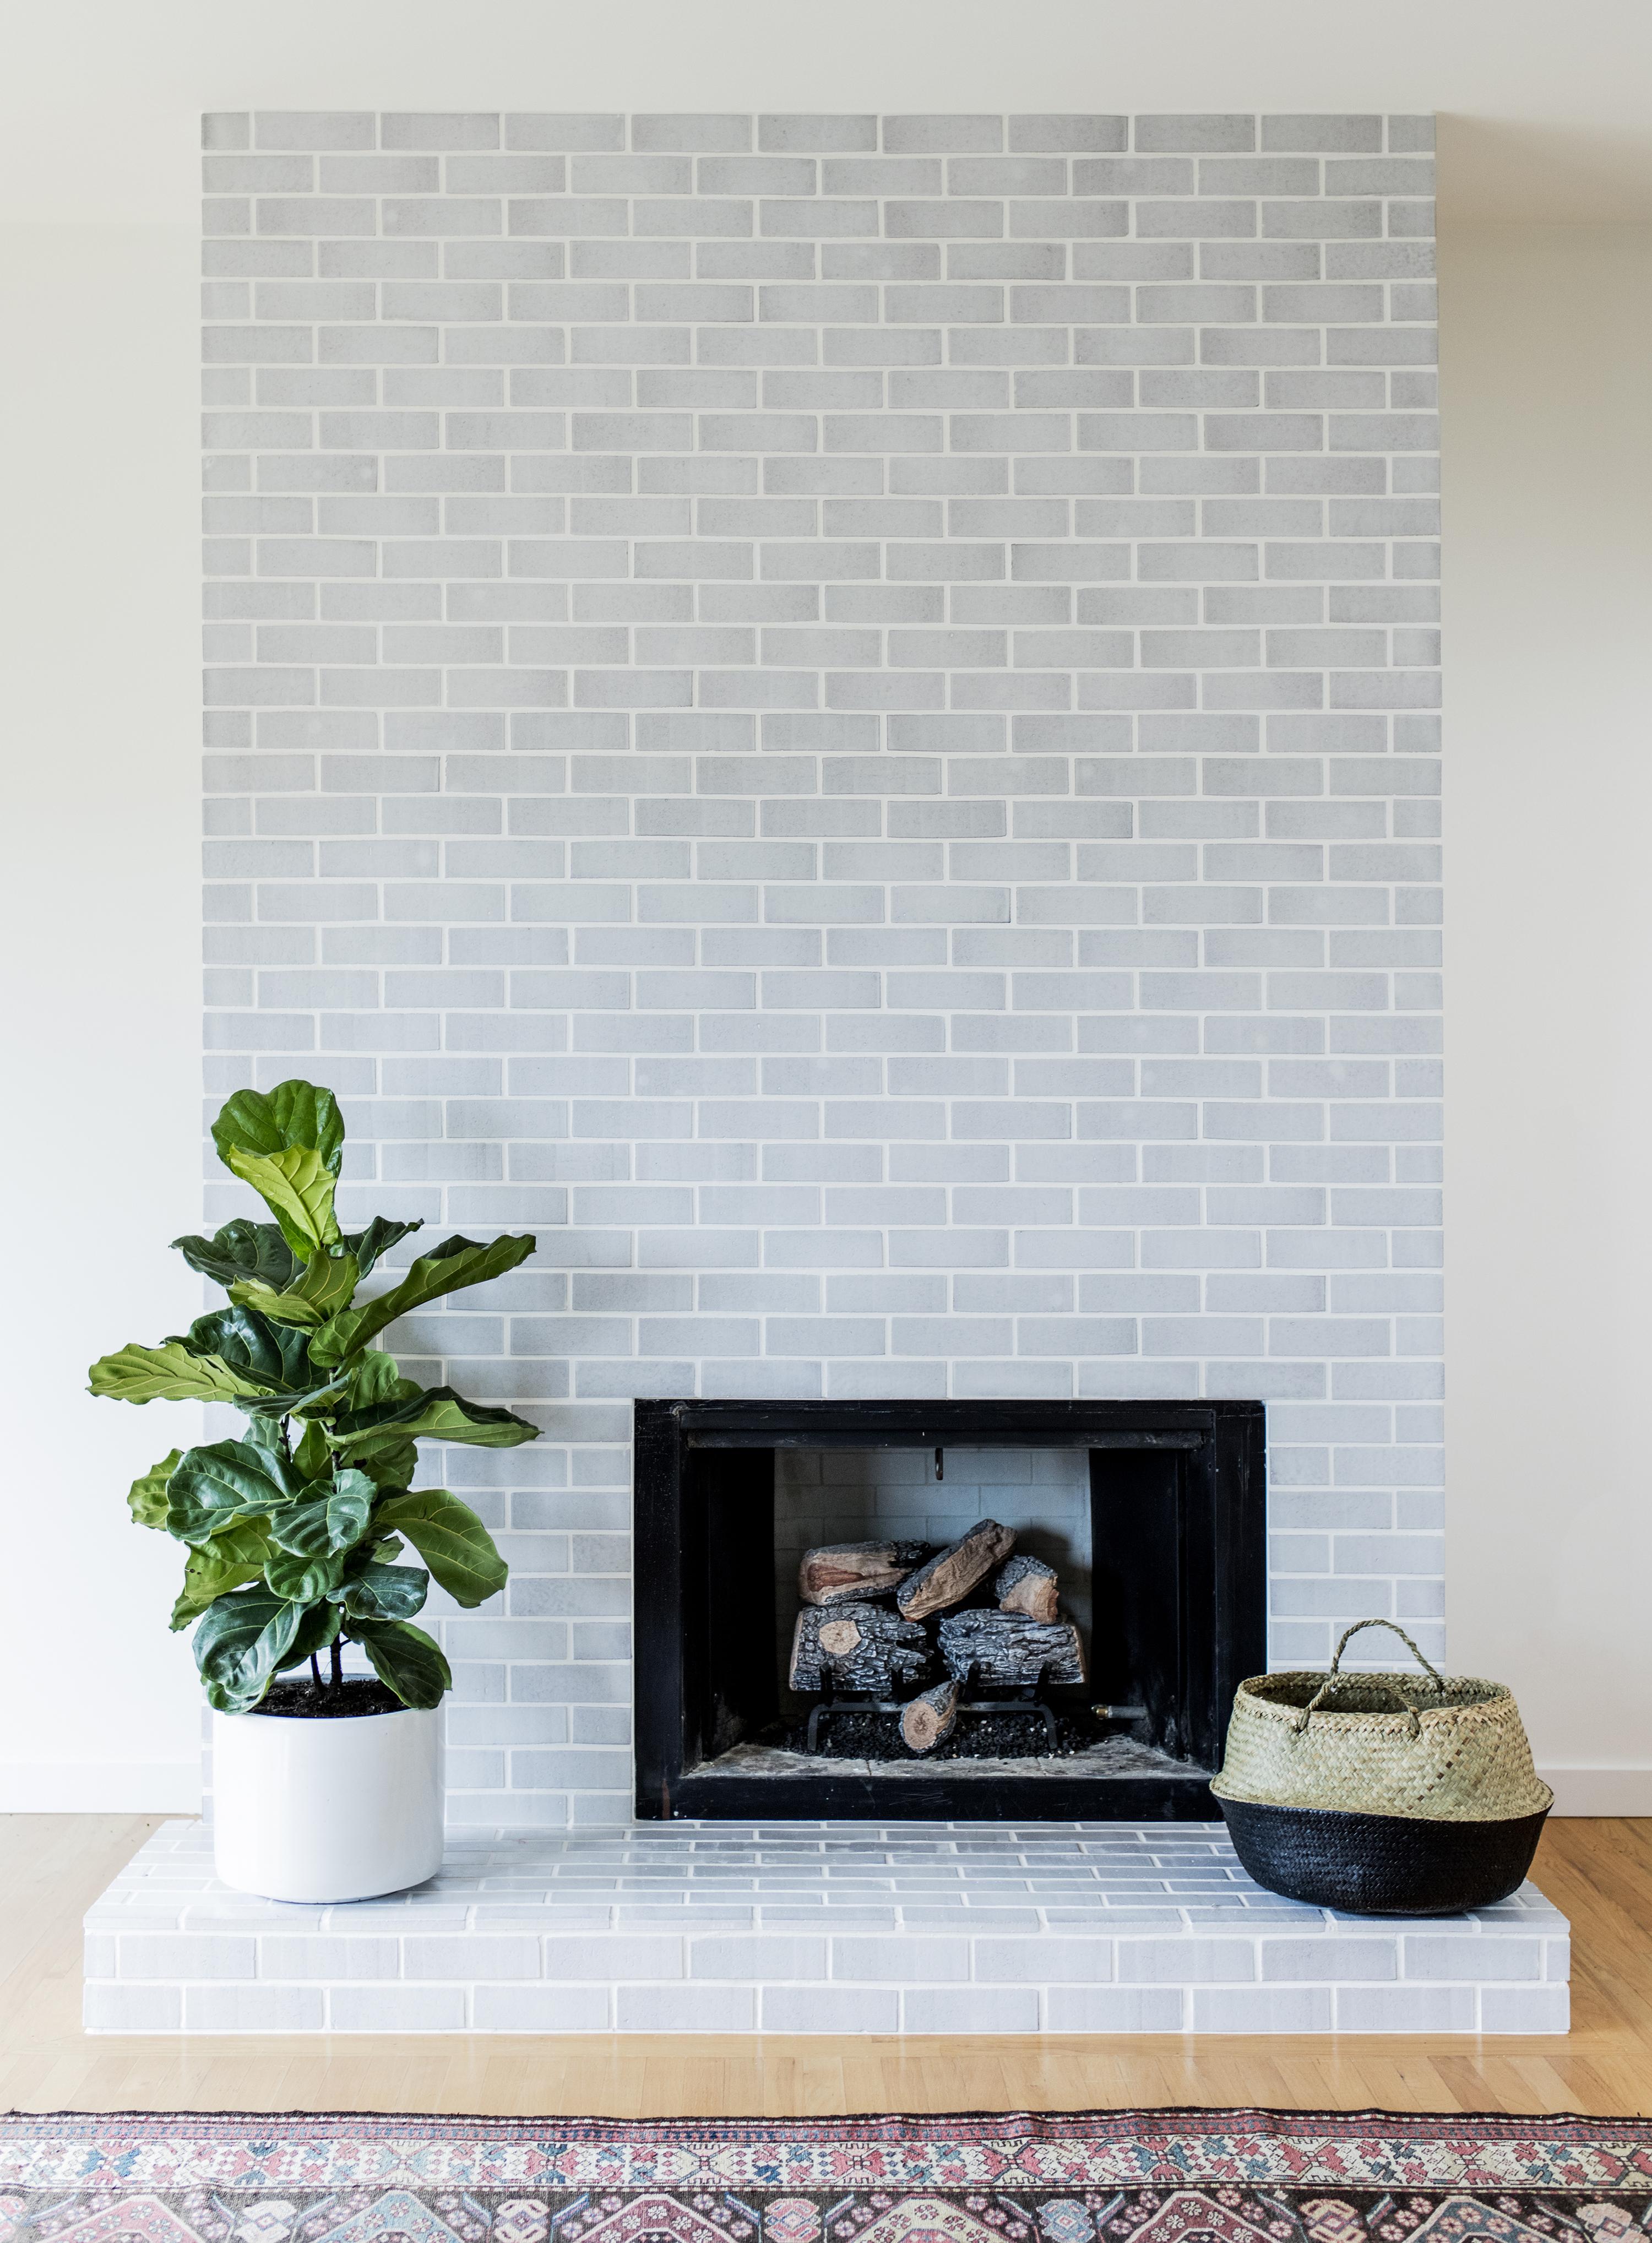 BLOG-Q1_2017_Image_residential_Kristen_Pena_fireplace_brick_cotton_white_mountains.jpg?mtime=20190417104942#asset:448463